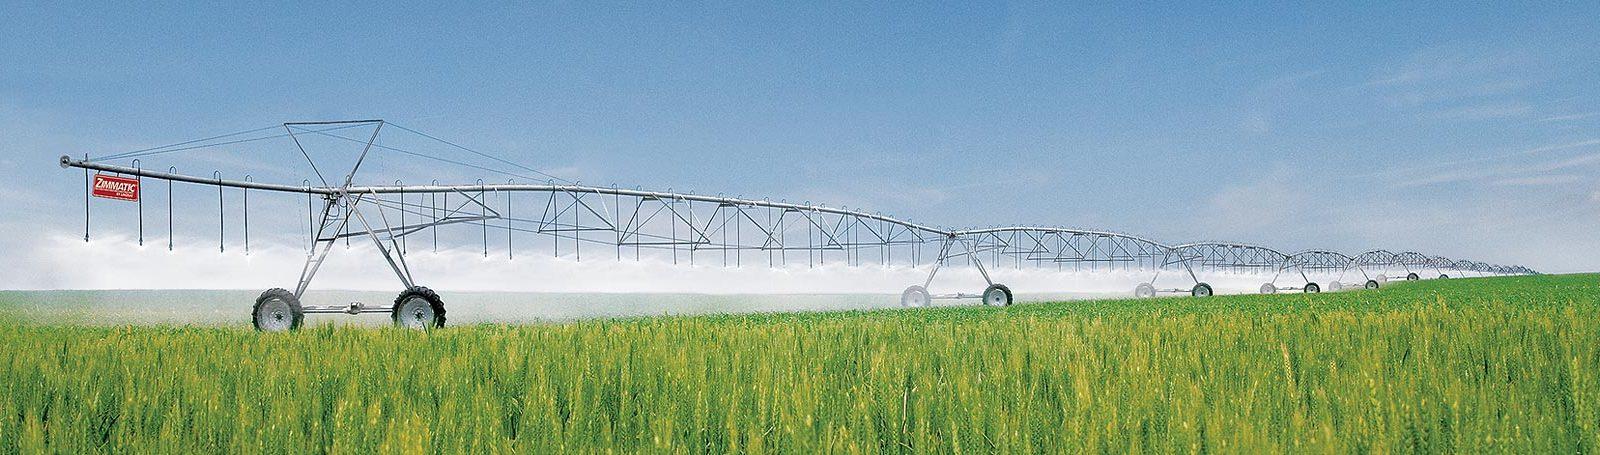 Zimmatic Pivots by Lindsay - Darling Irrigation